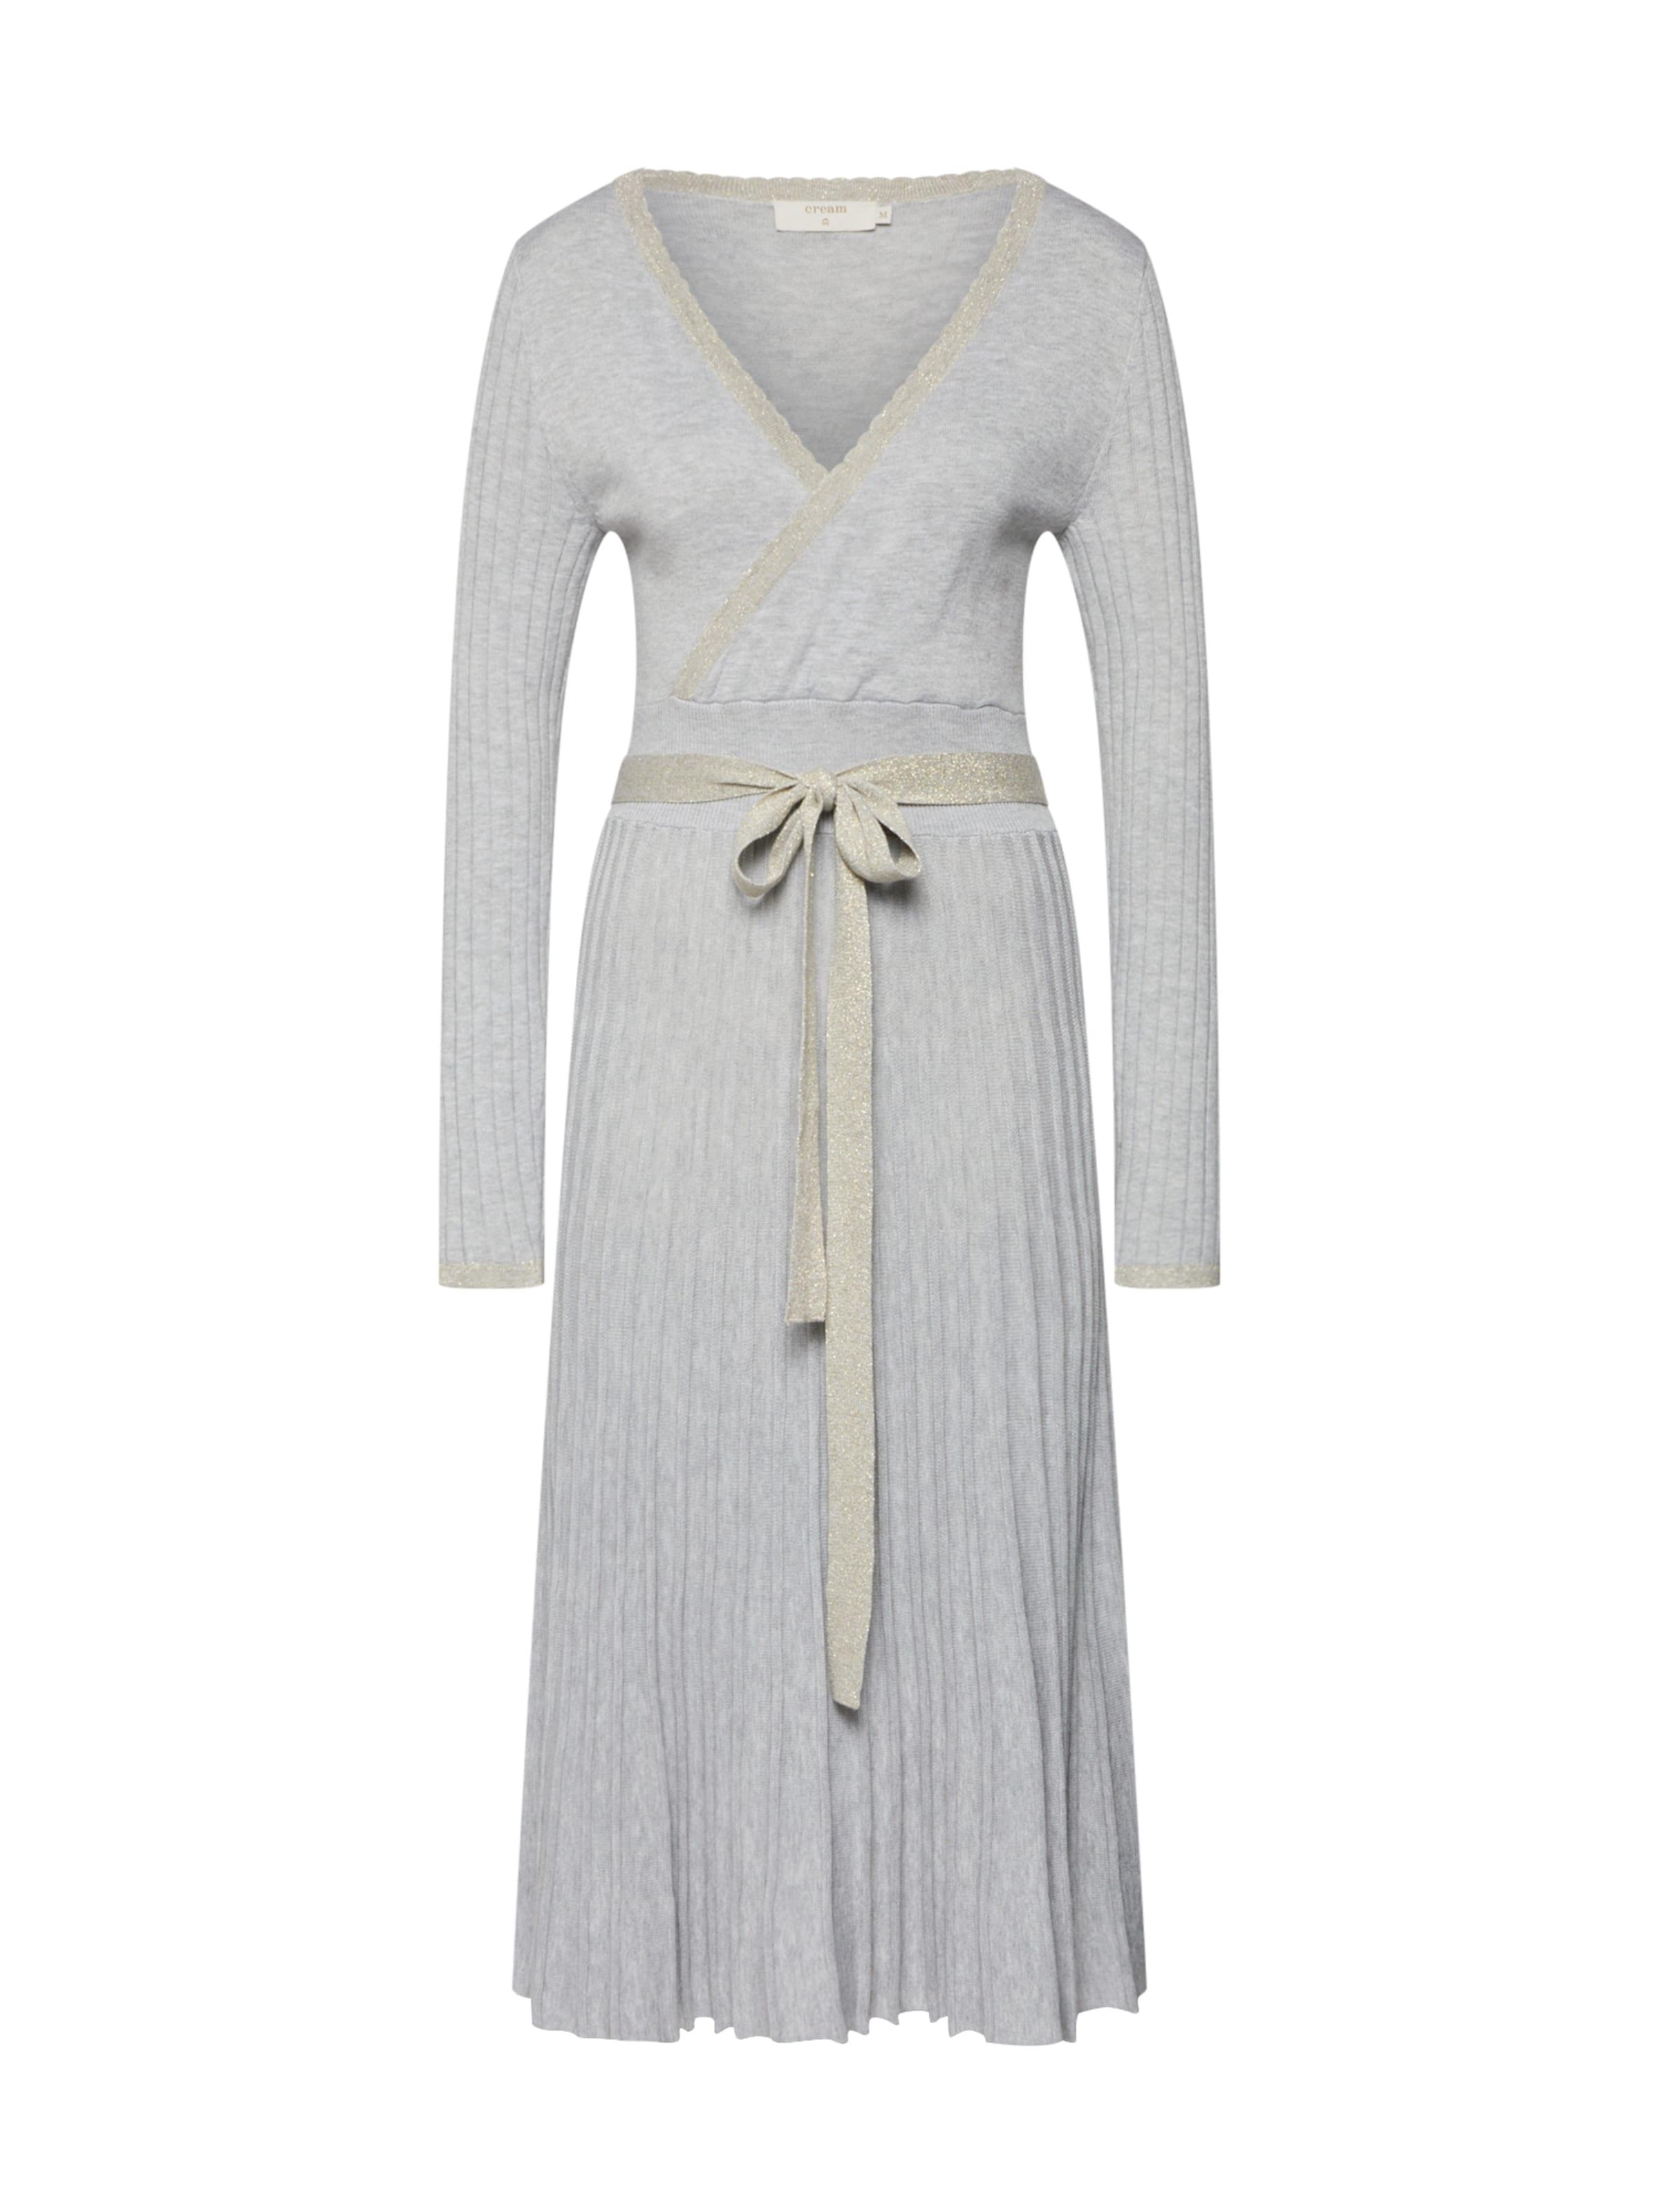 Maille Robes Dress' Clair En Cream 'clary Gris Knit FKT1J3ulc